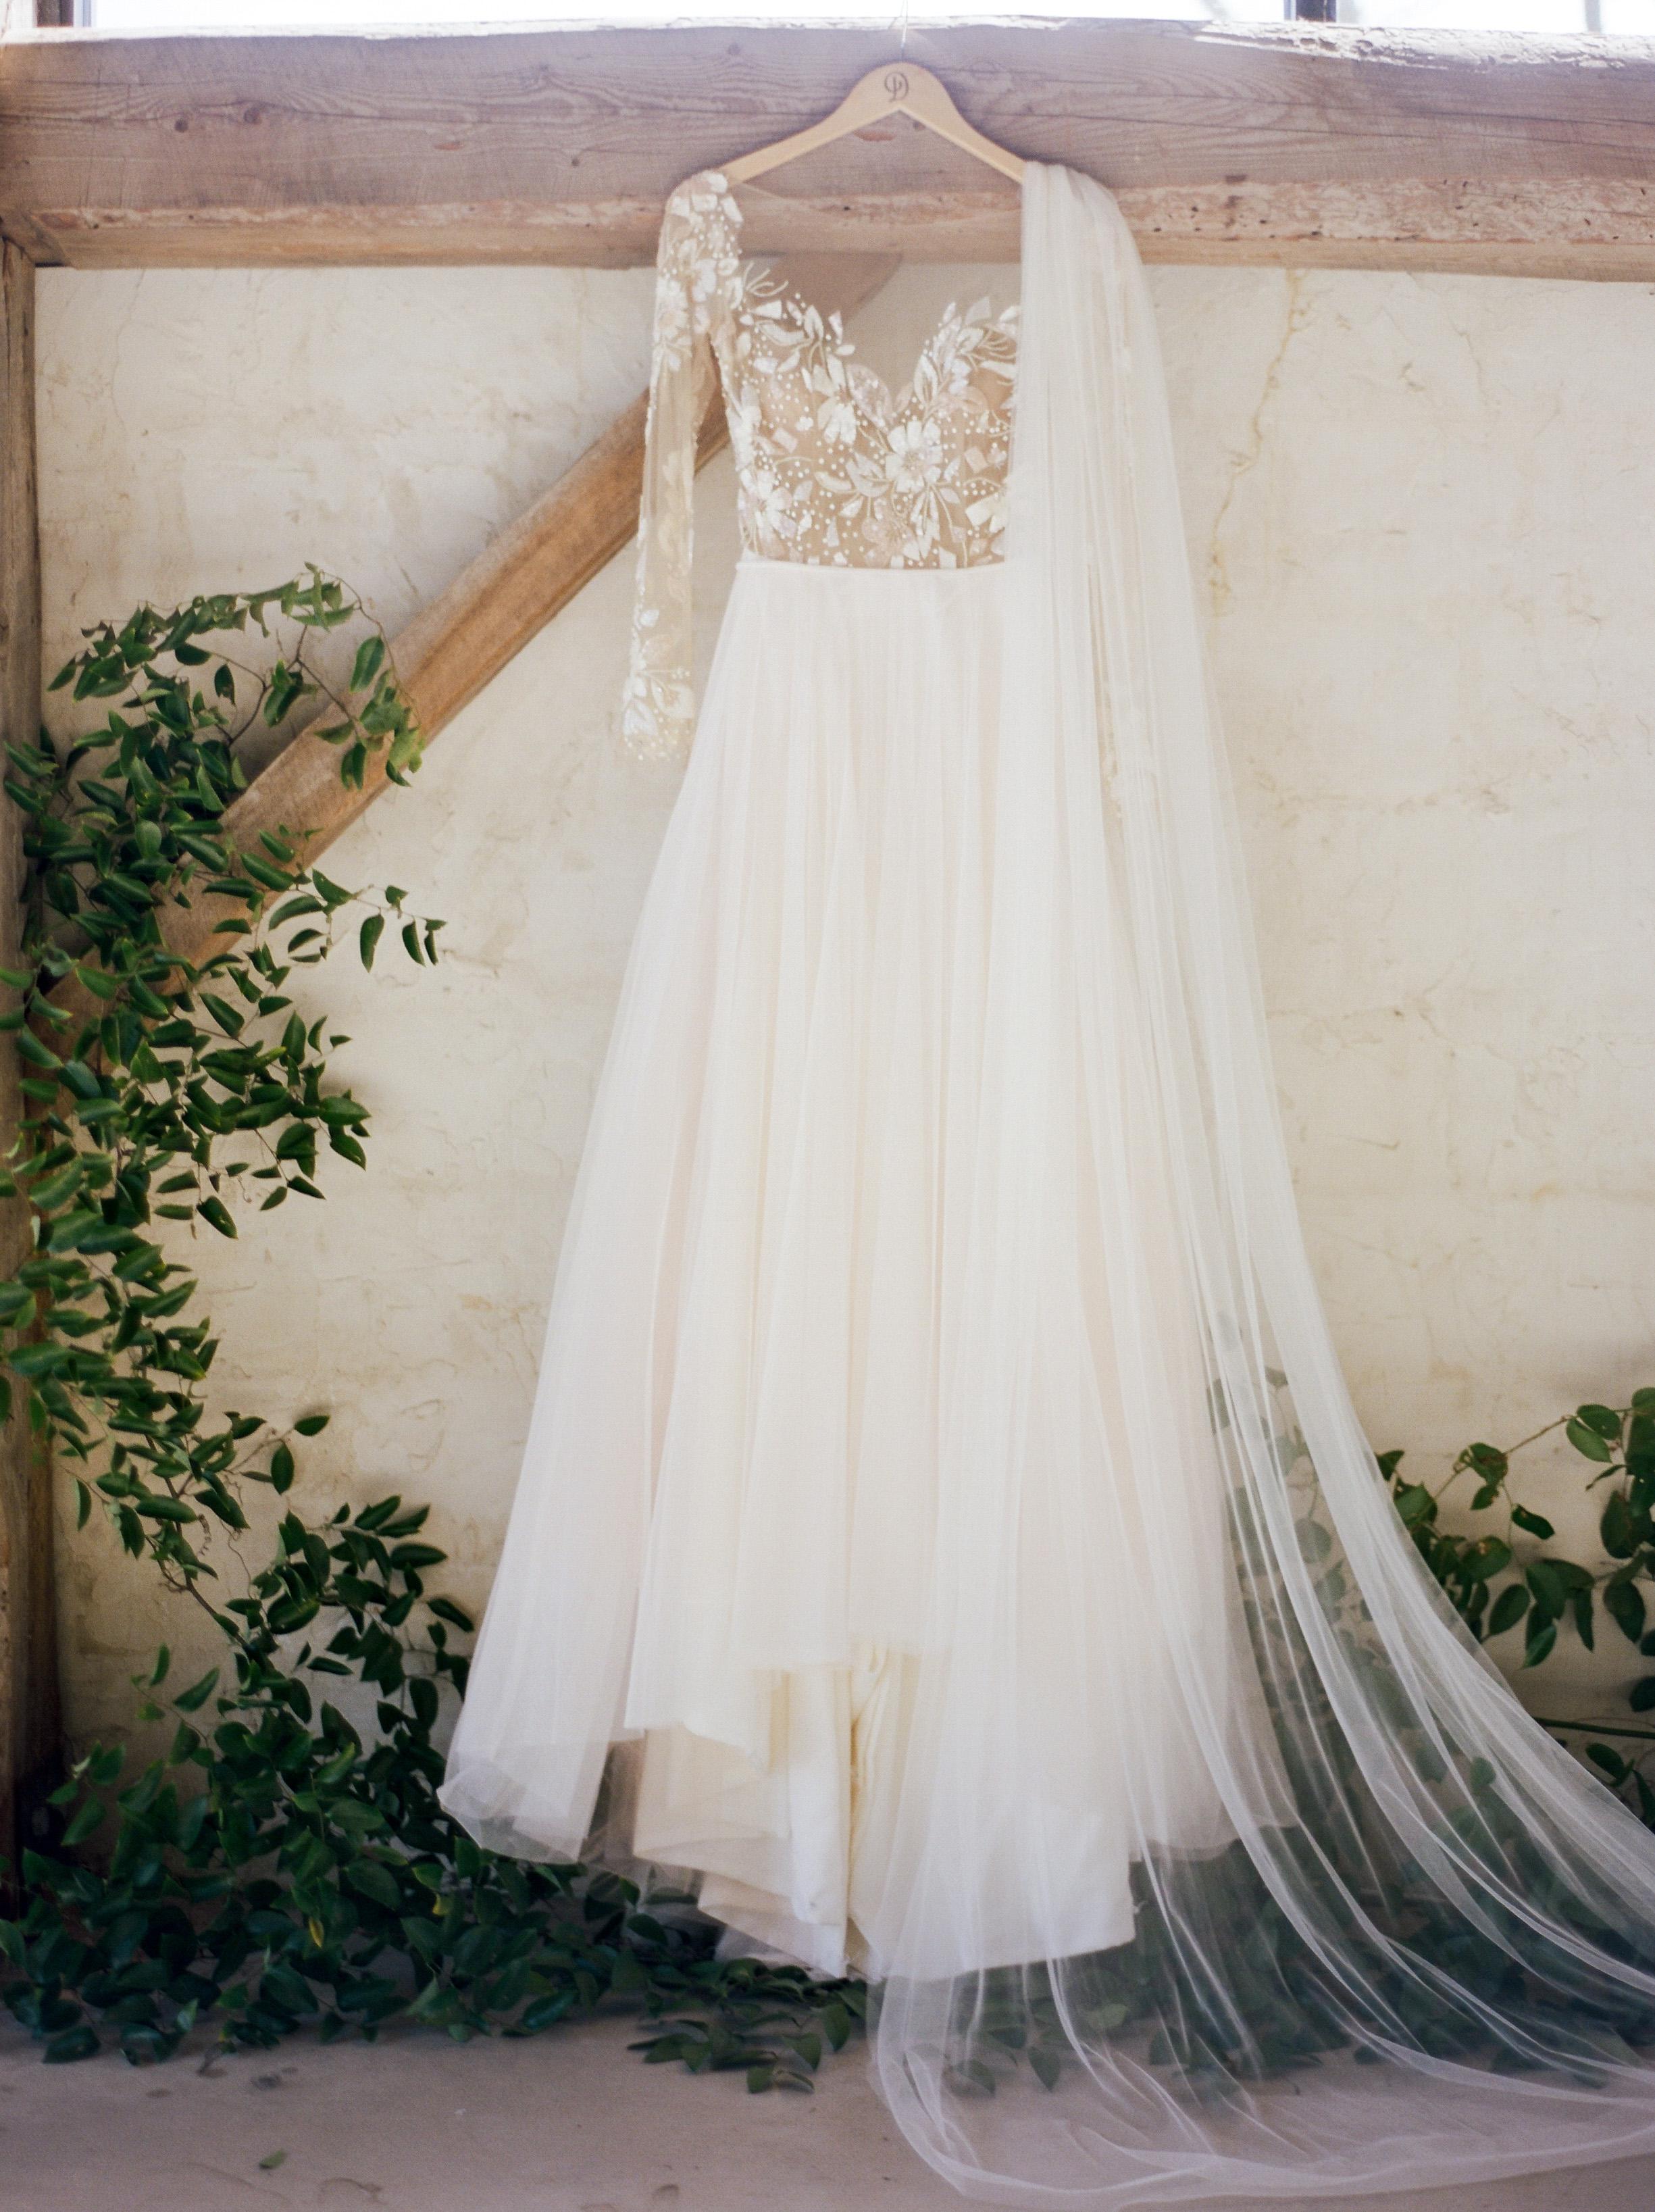 The-Knot-50-Weddings-50-States-Texas-Winner-Dana-Fernandez-photography-houston-wedding-photographer-film-fine-art-destination-5.jpg